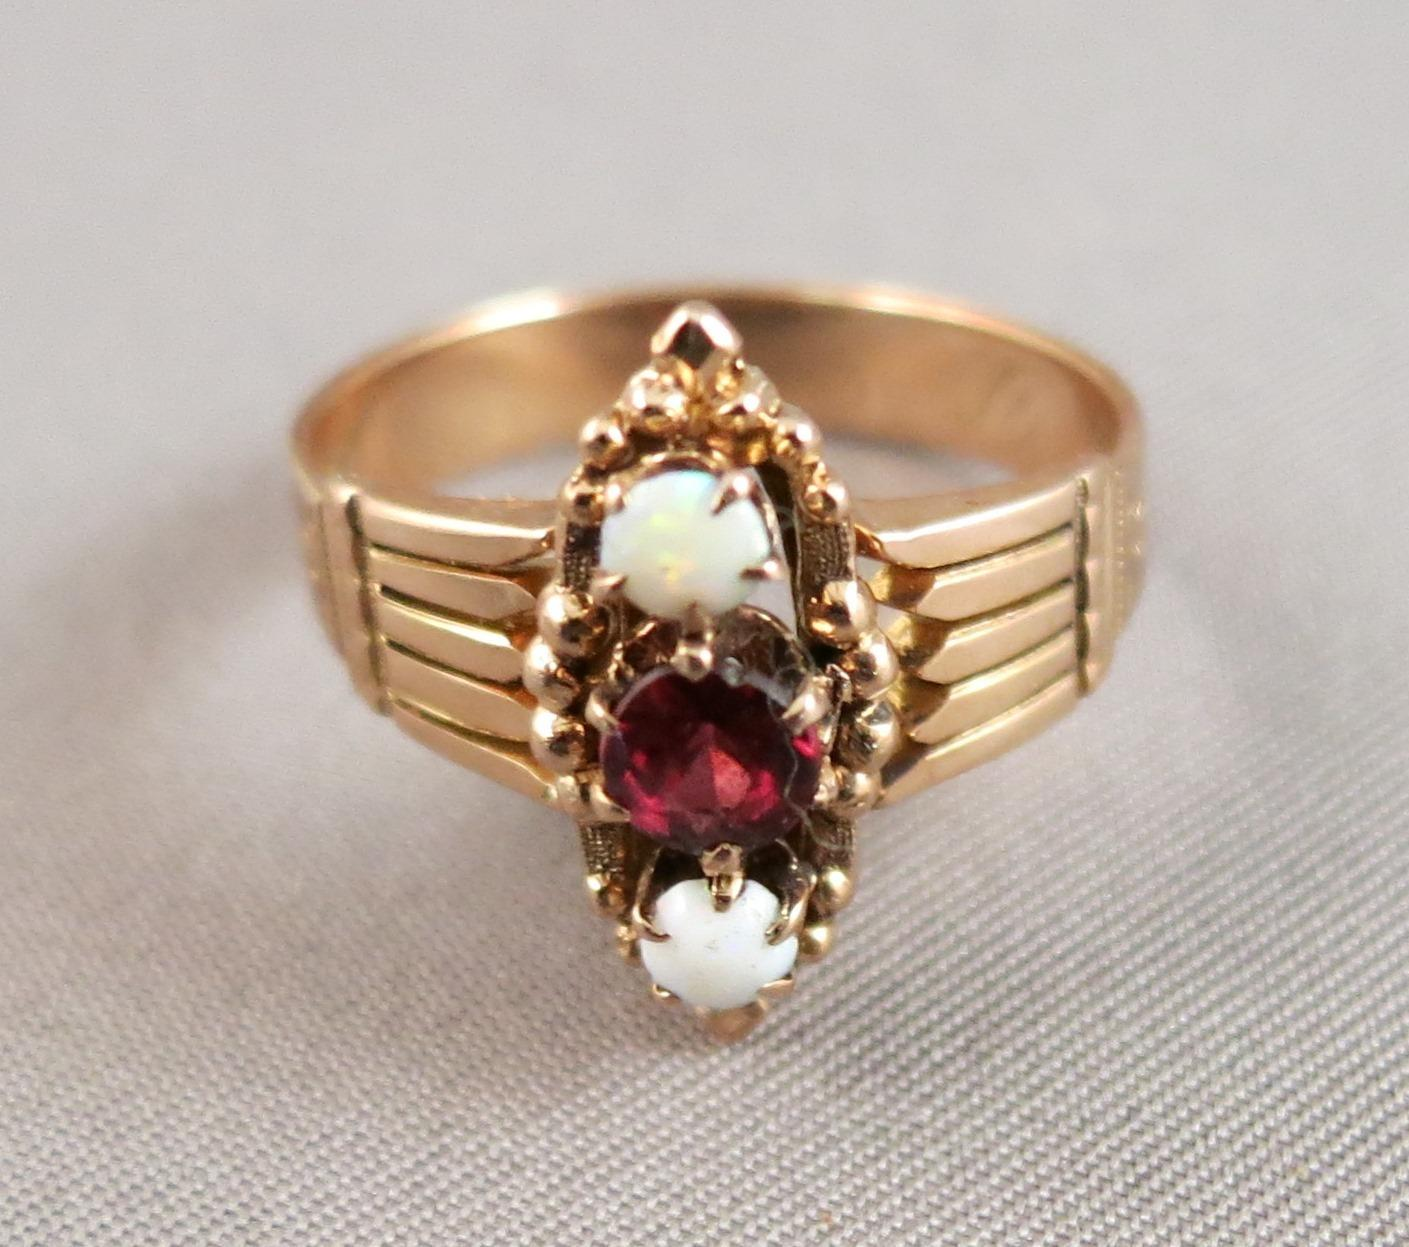 VINTAGE Rose Gold Older Ring With Opals and Garnet  Size 61/2